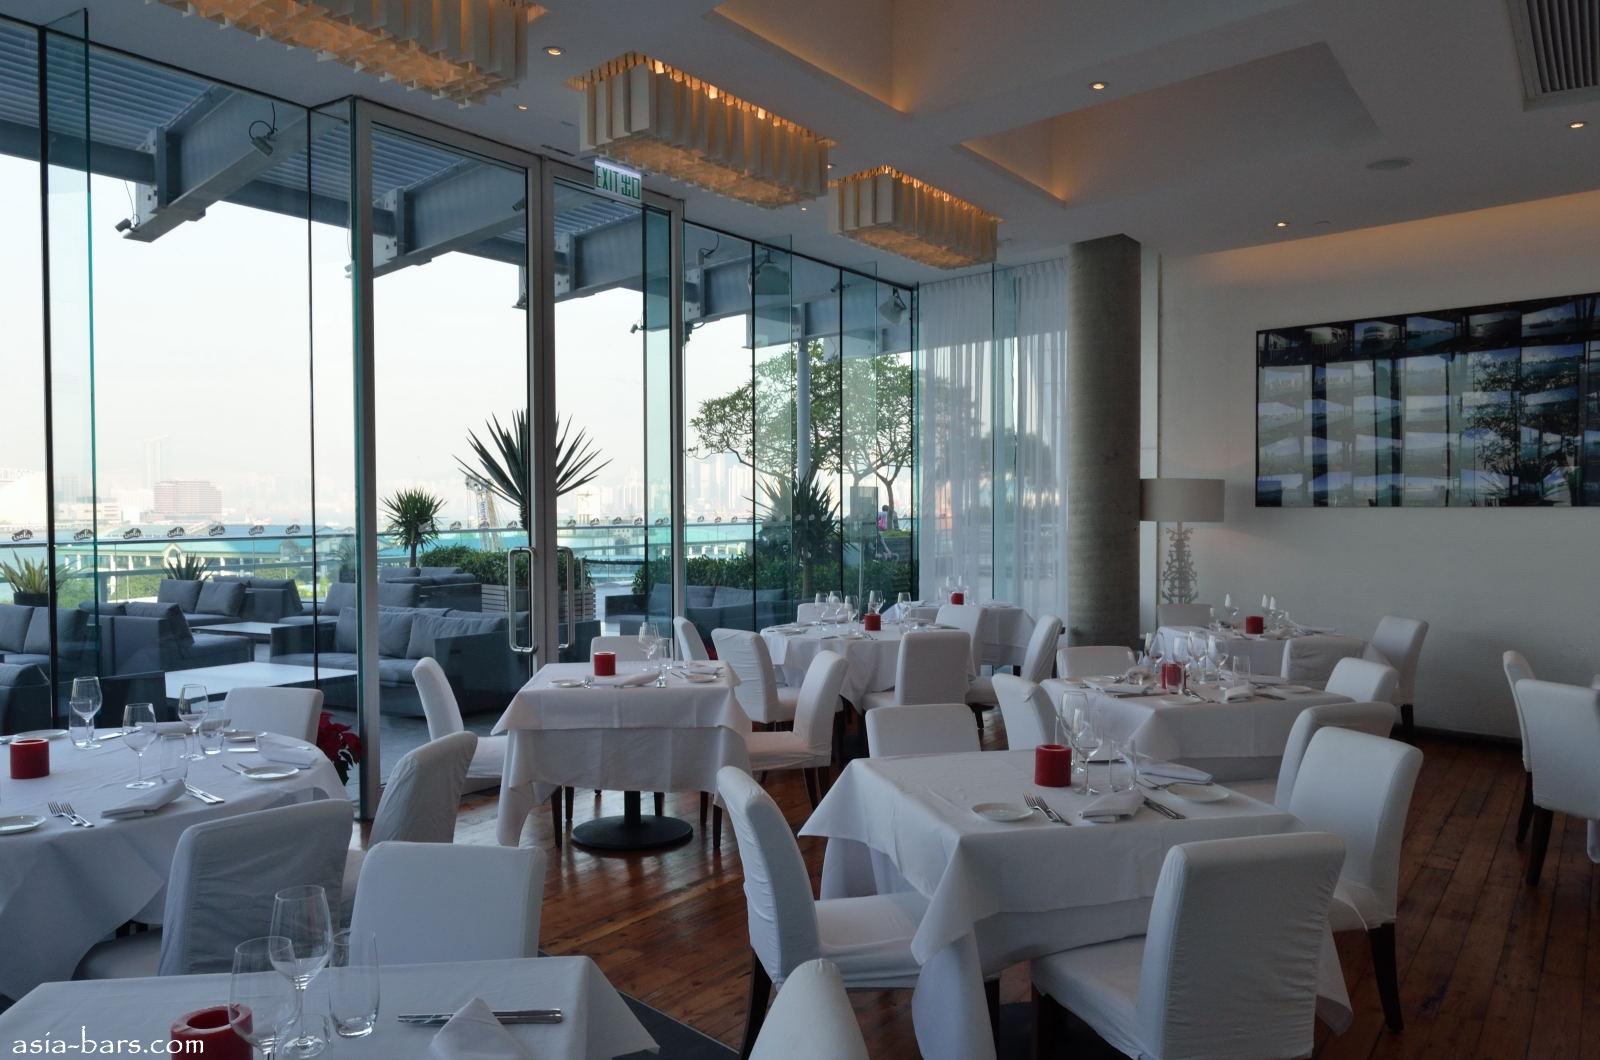 Isola Bar Grill Elegant Italian Restaurant Overlooking